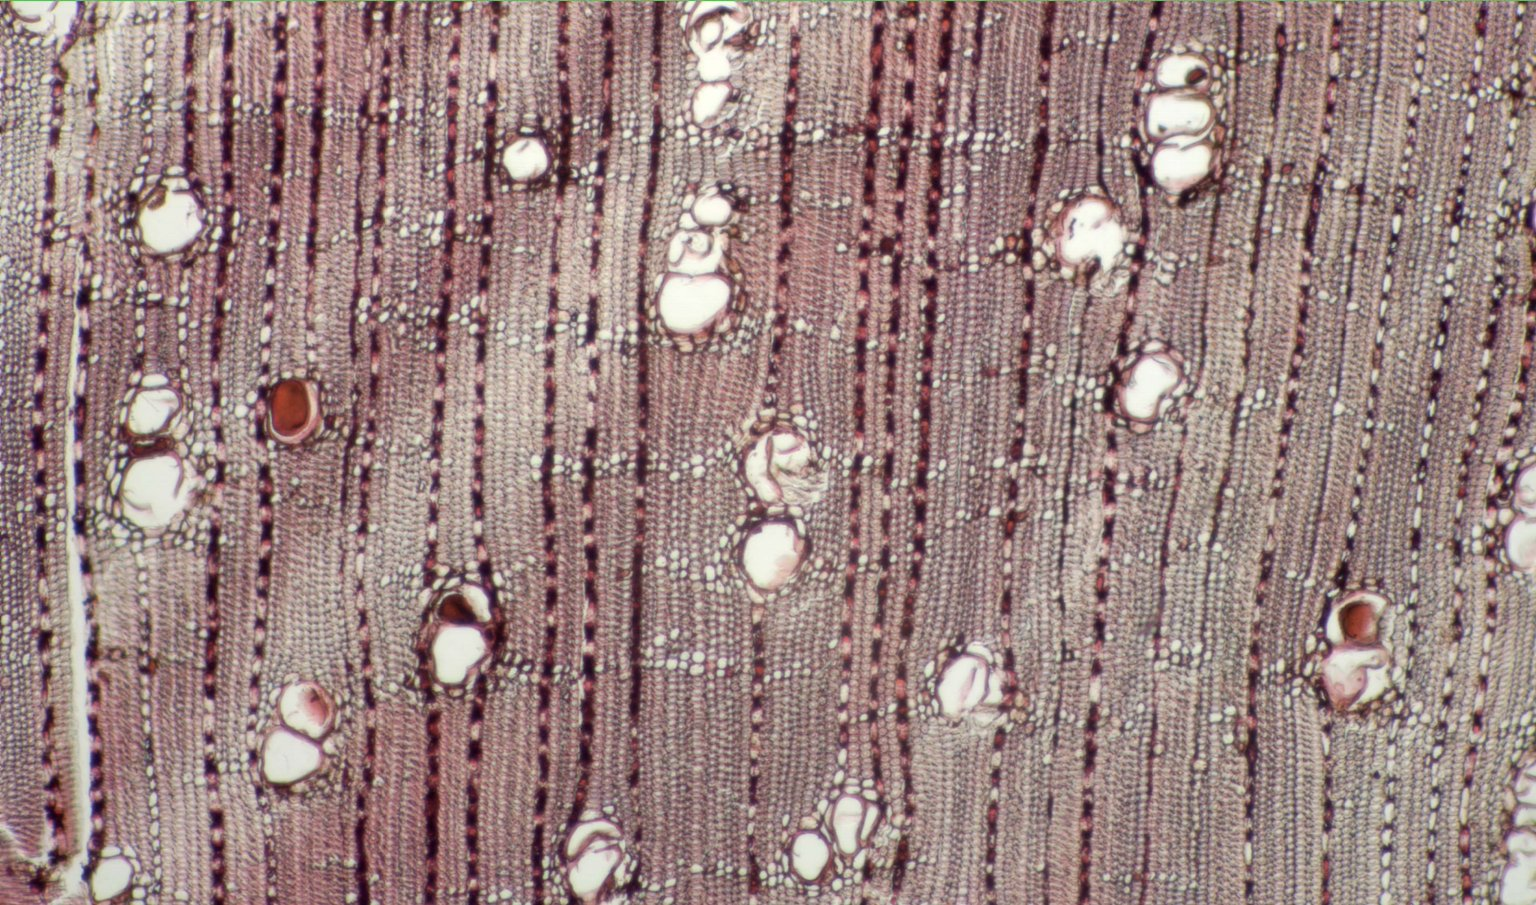 MELIACEAE Trichilia micrantha